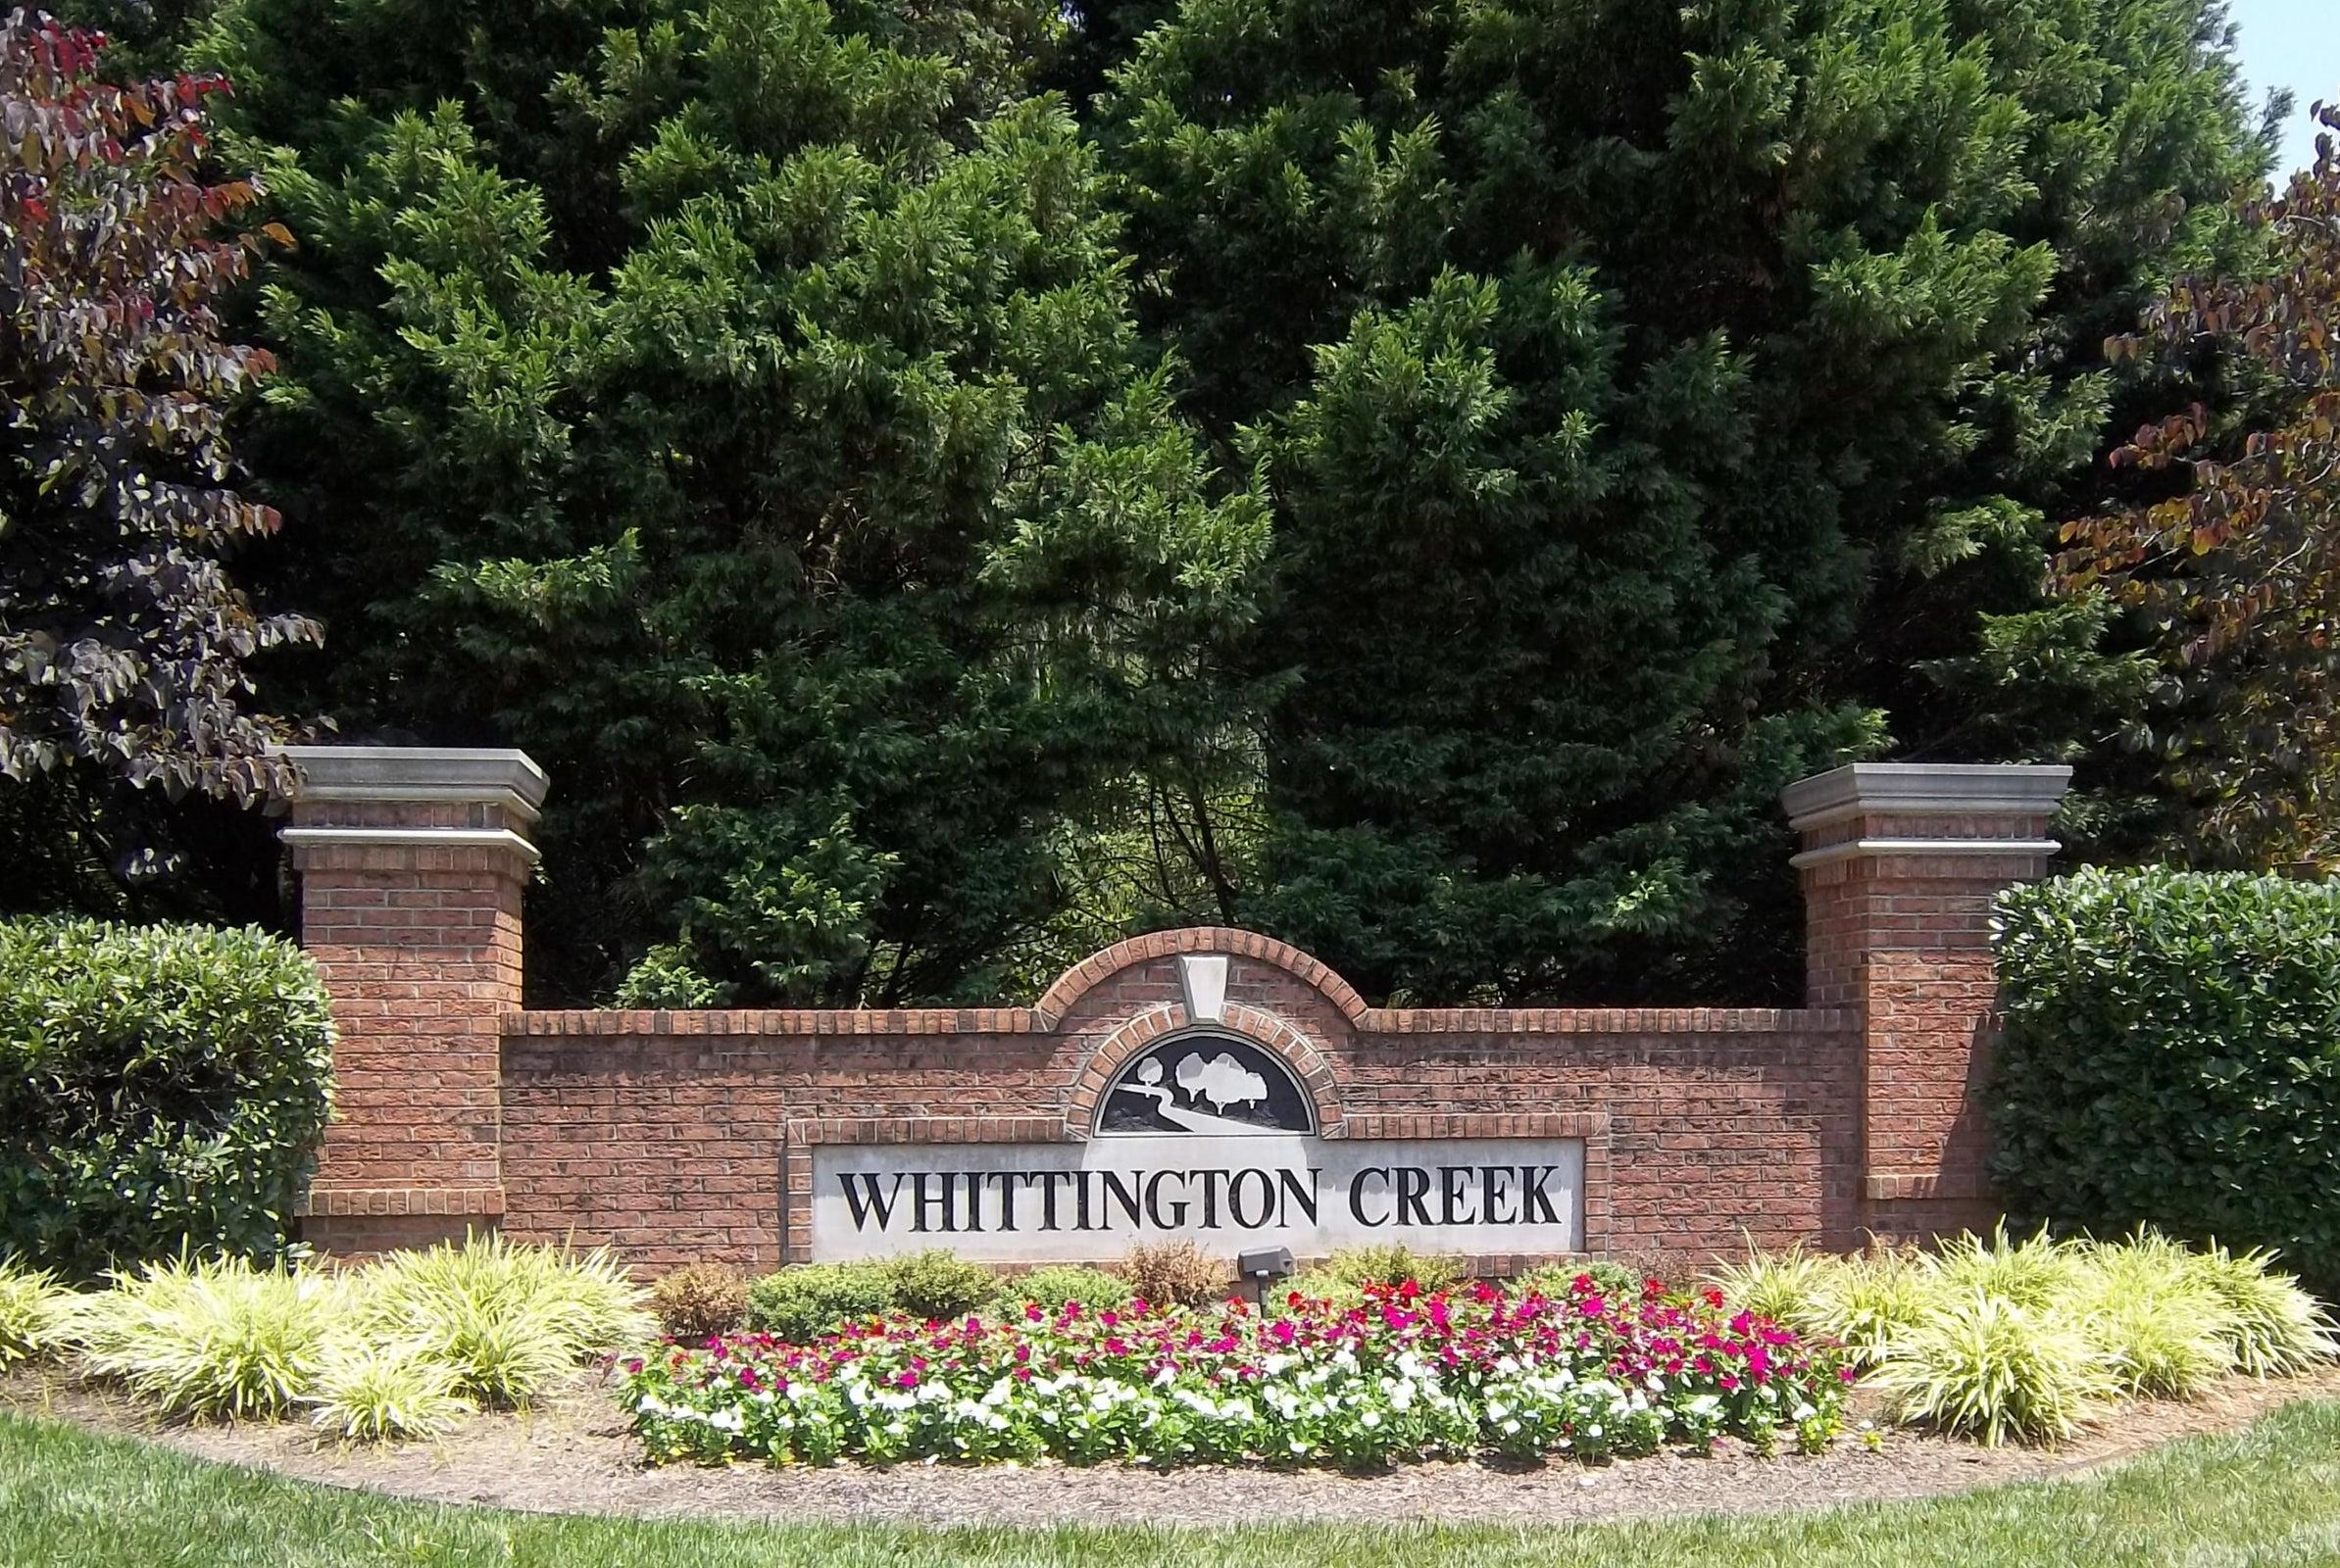 Welcome to Whittington Creek